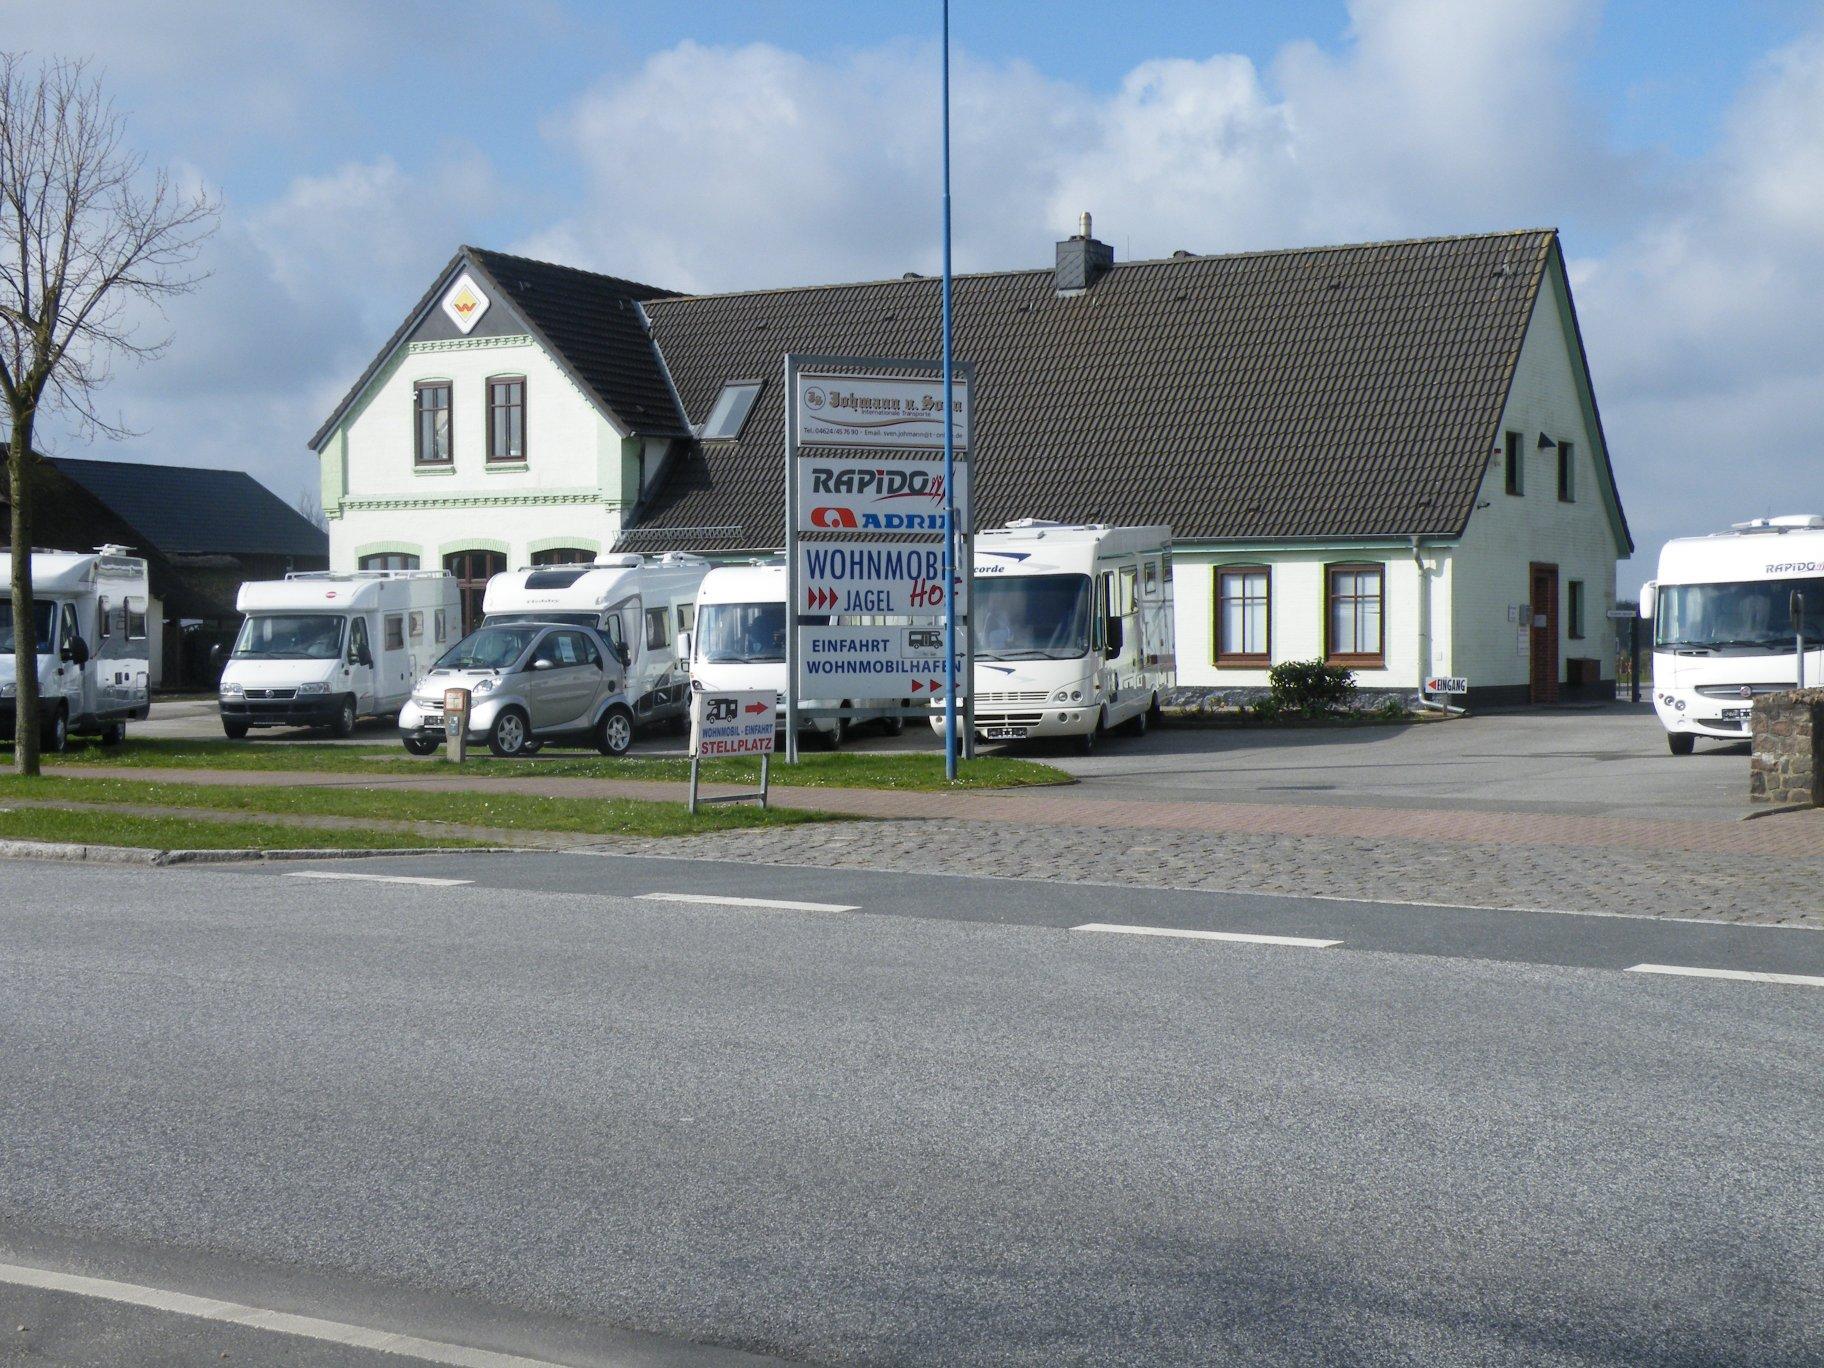 Wohnmobilhof Jagel